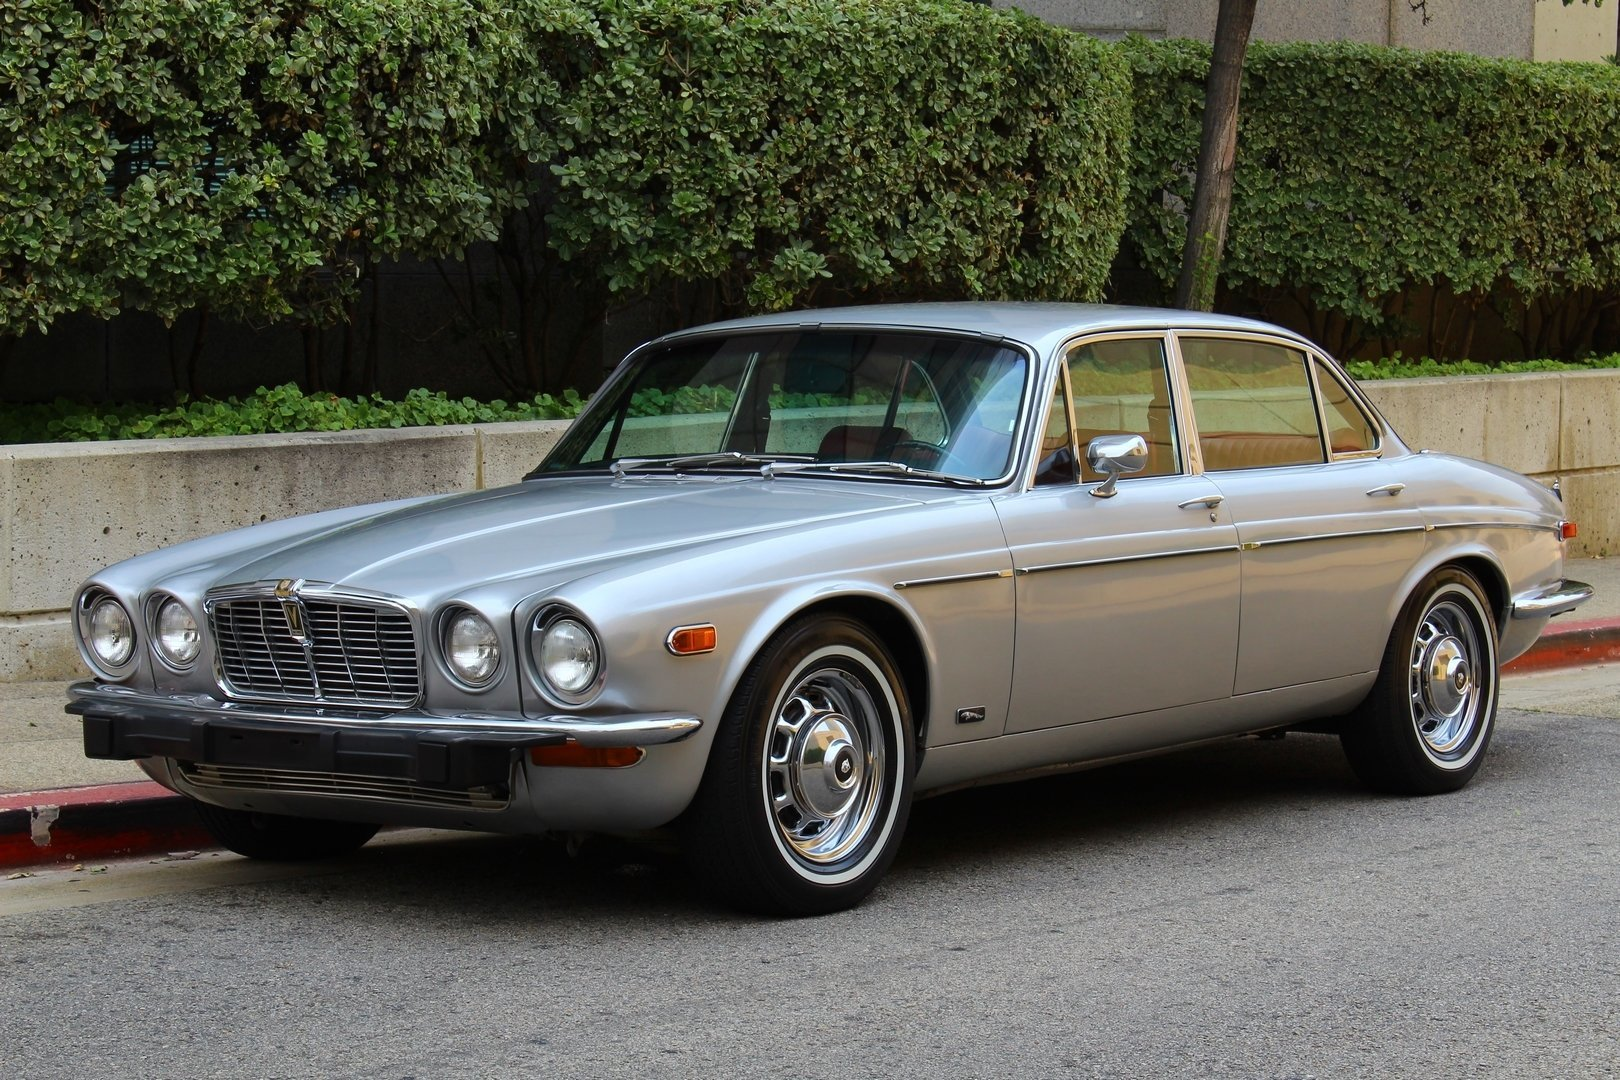 1973 Jaguar XJ12 for sale #98485 | MCG